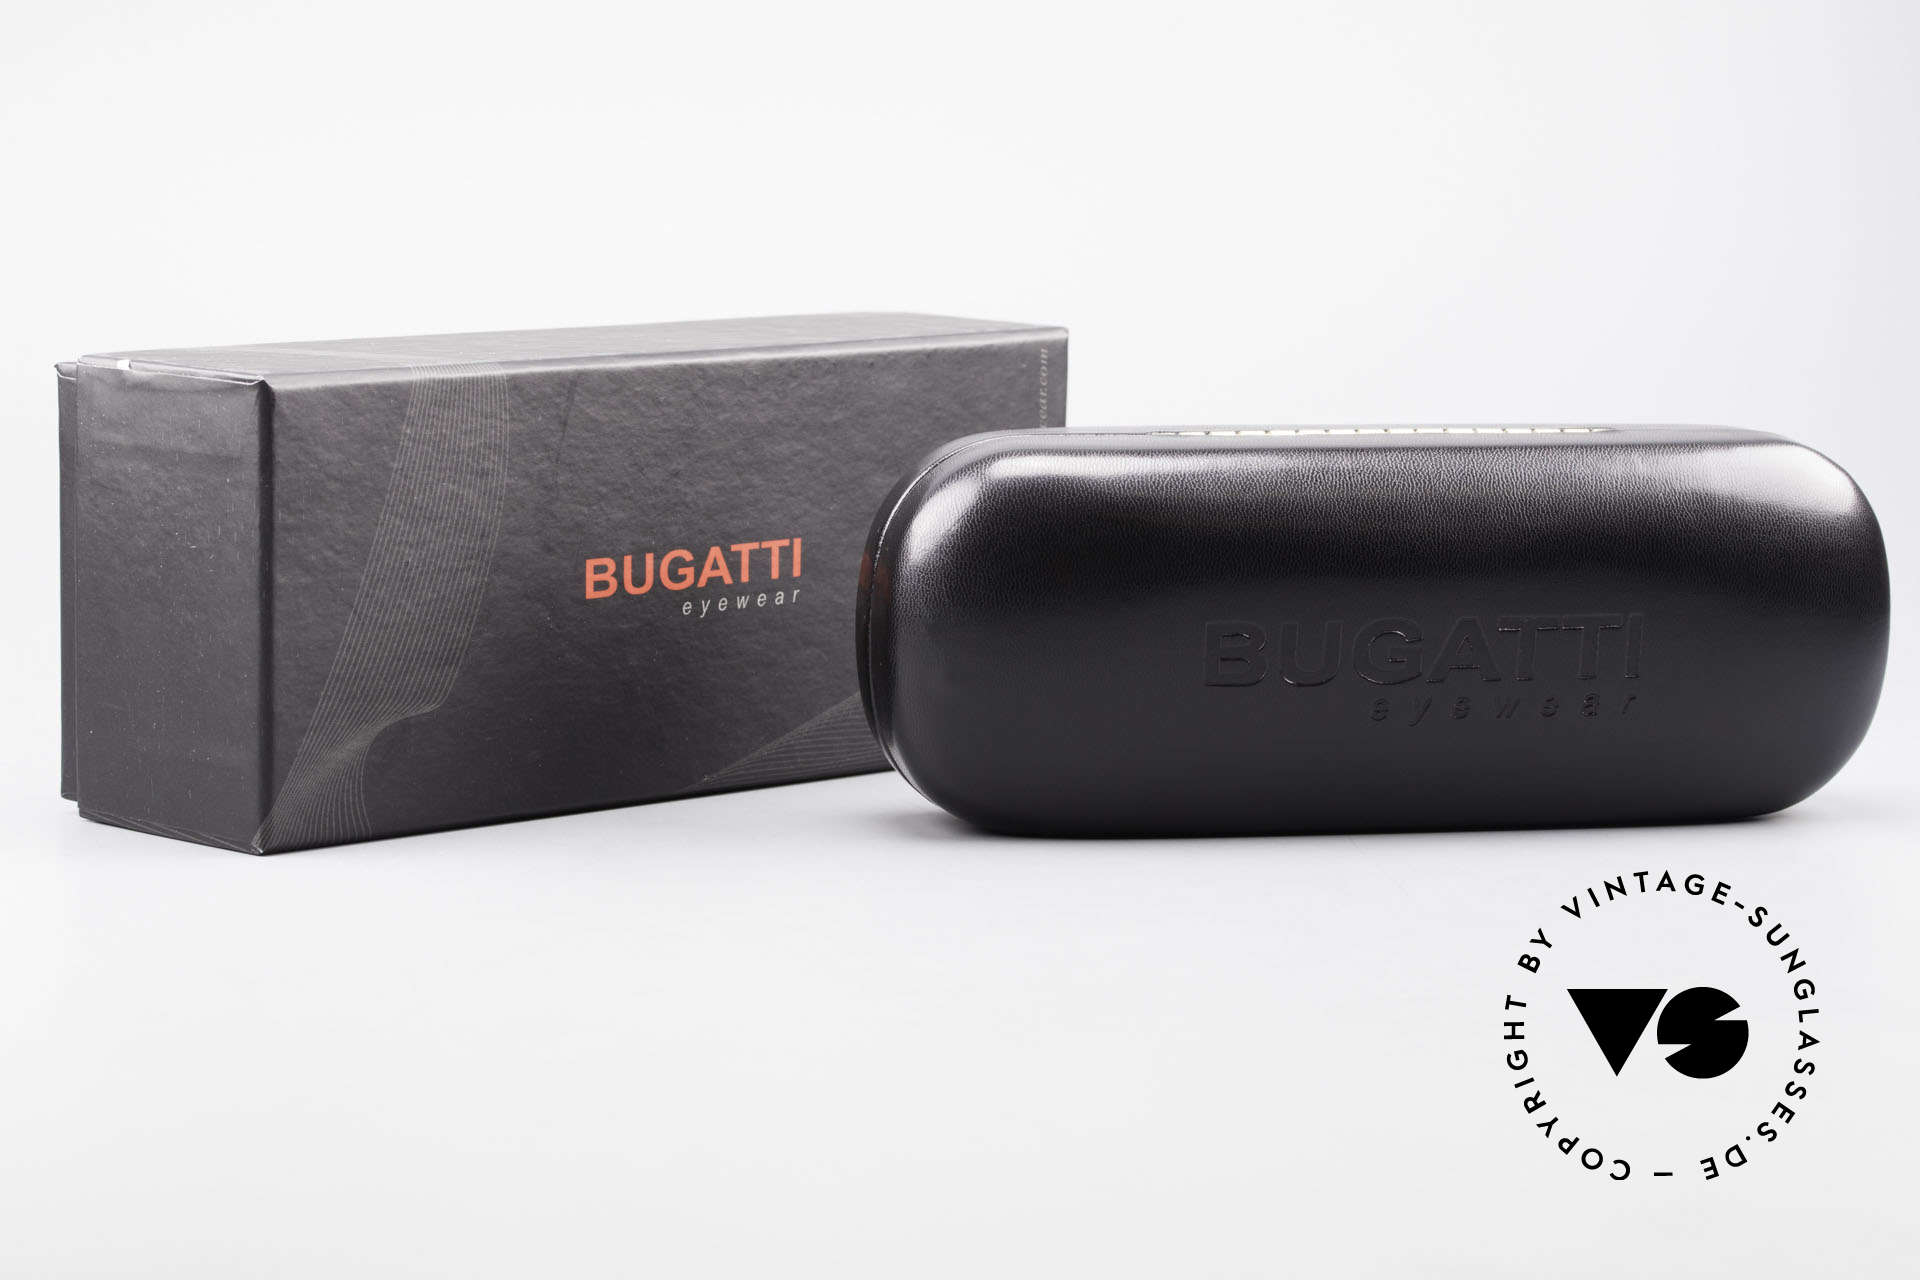 Bugatti 10868 Luxury Vintage Sunglasses Men, Size: medium, Made for Men